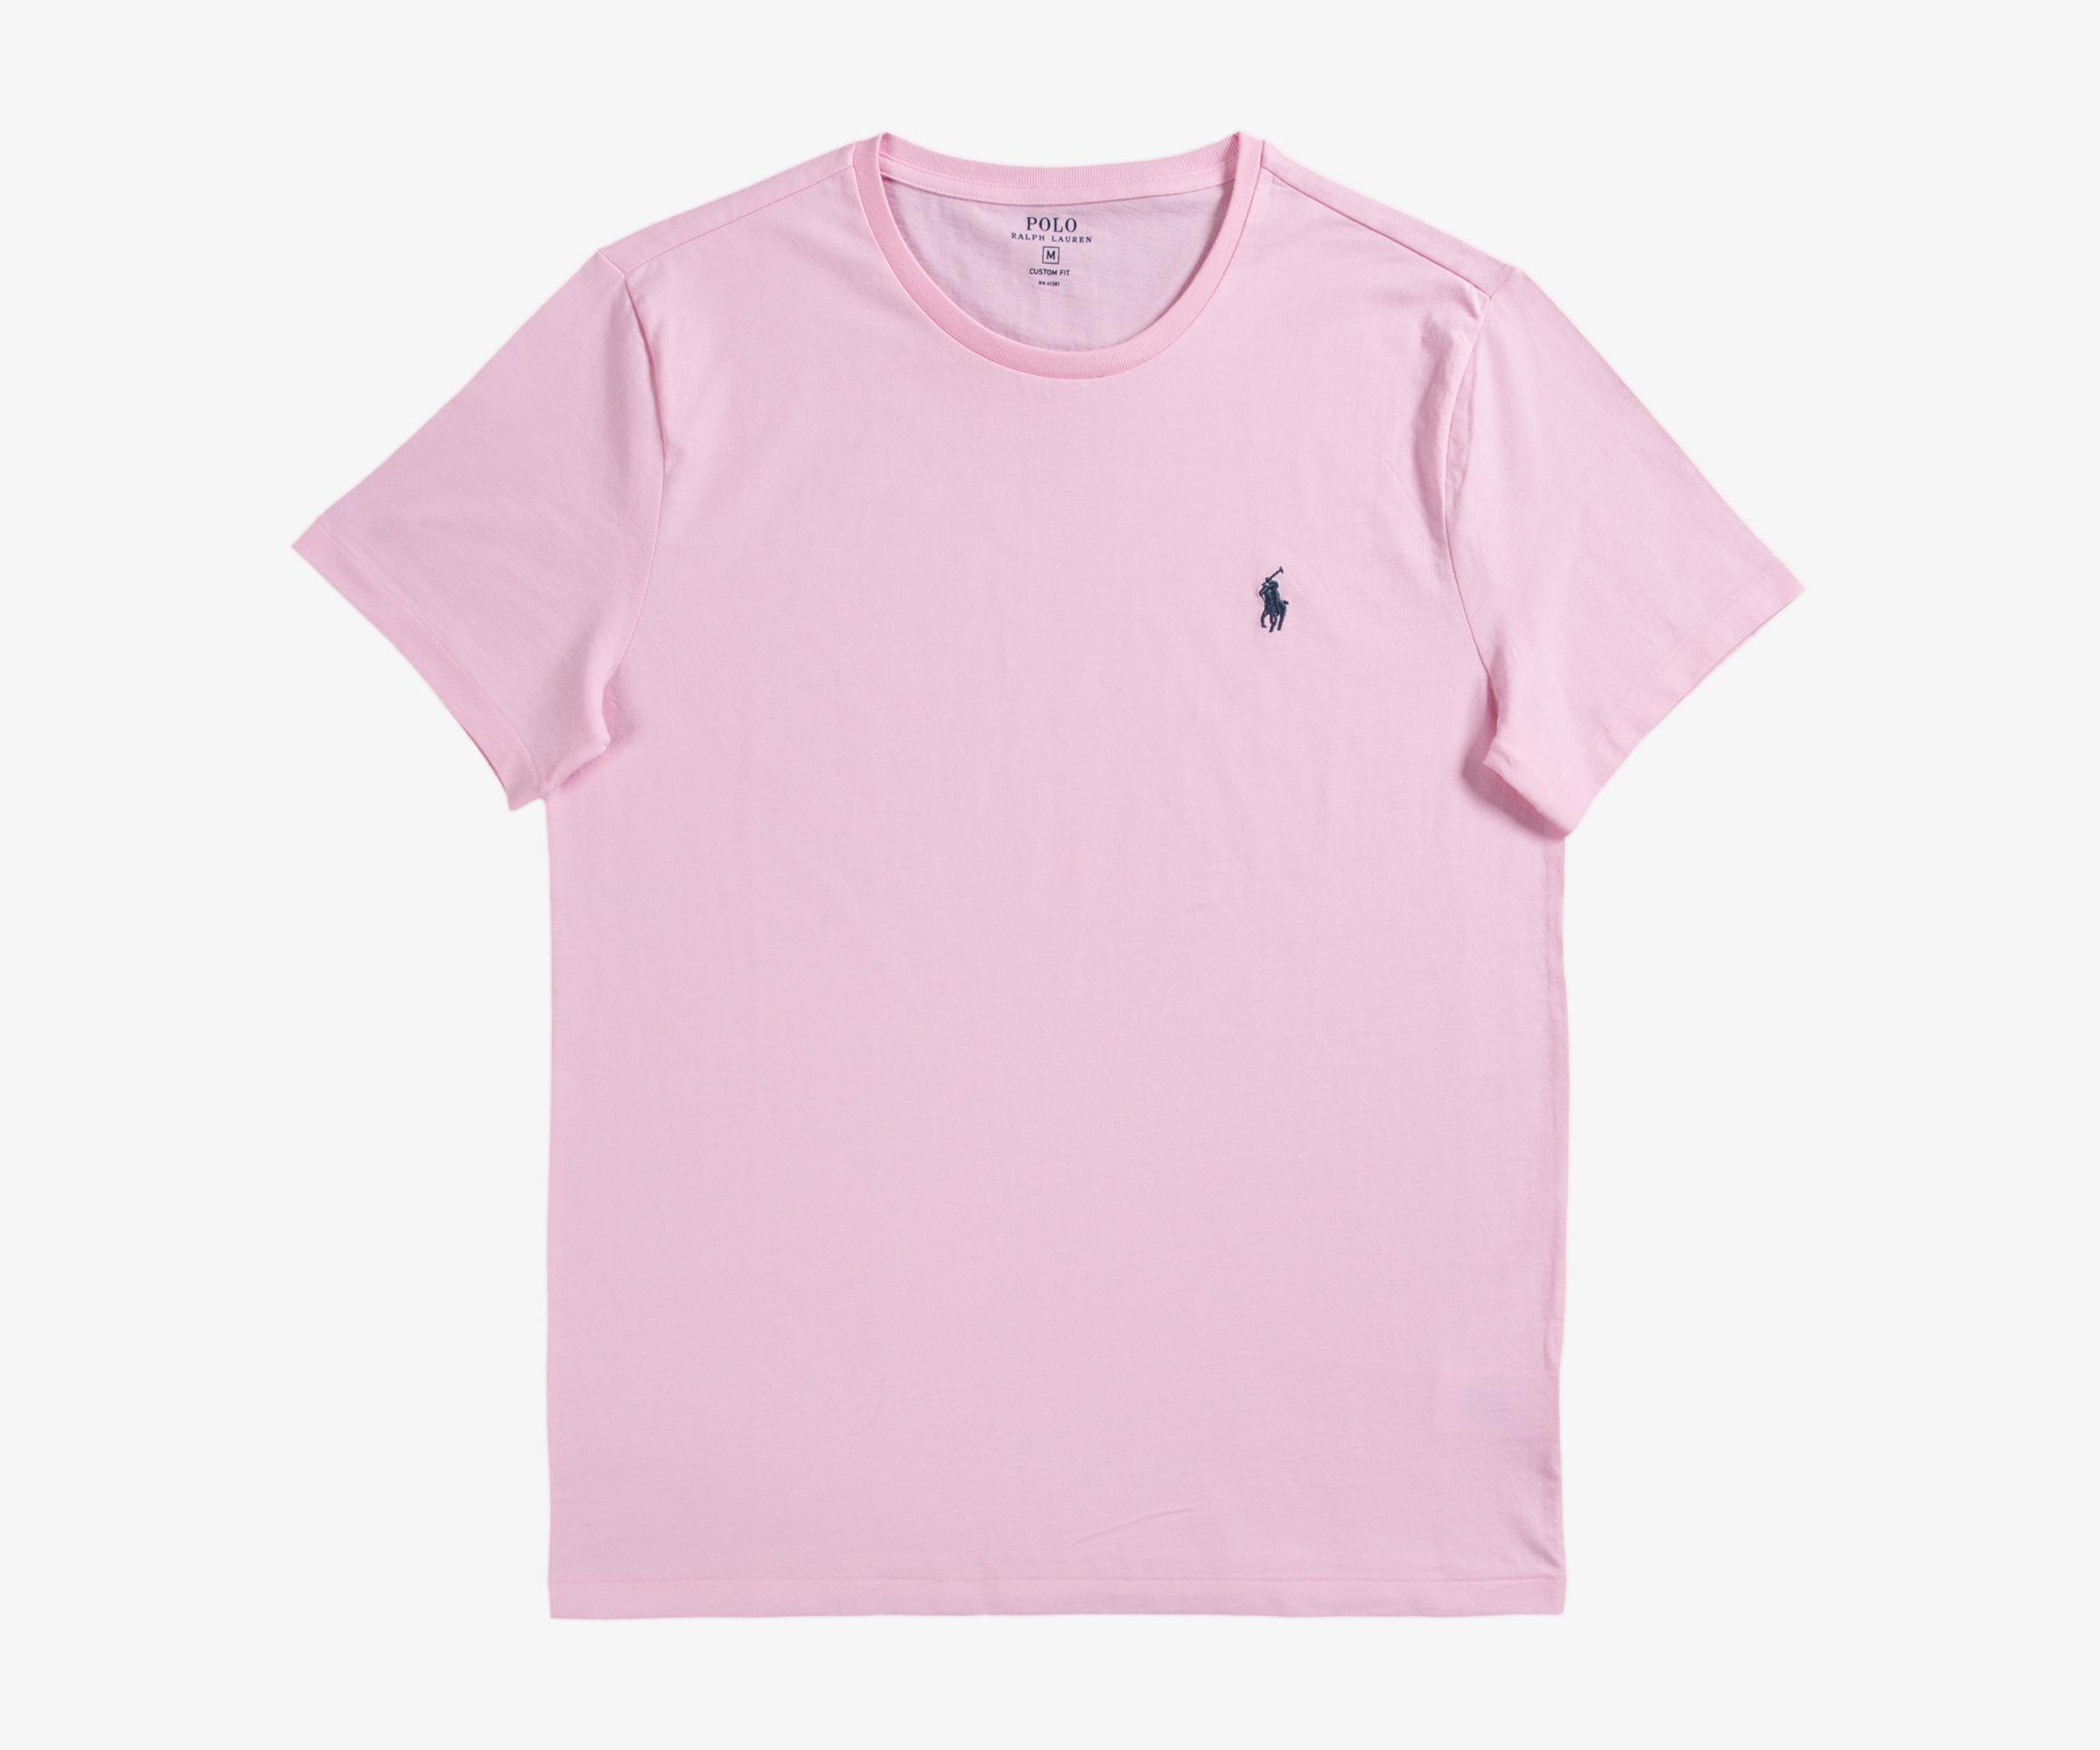 Carmel In Classic For Men Lauren Custom T Ralph Shirt Pink Fit 8XwON0Pkn